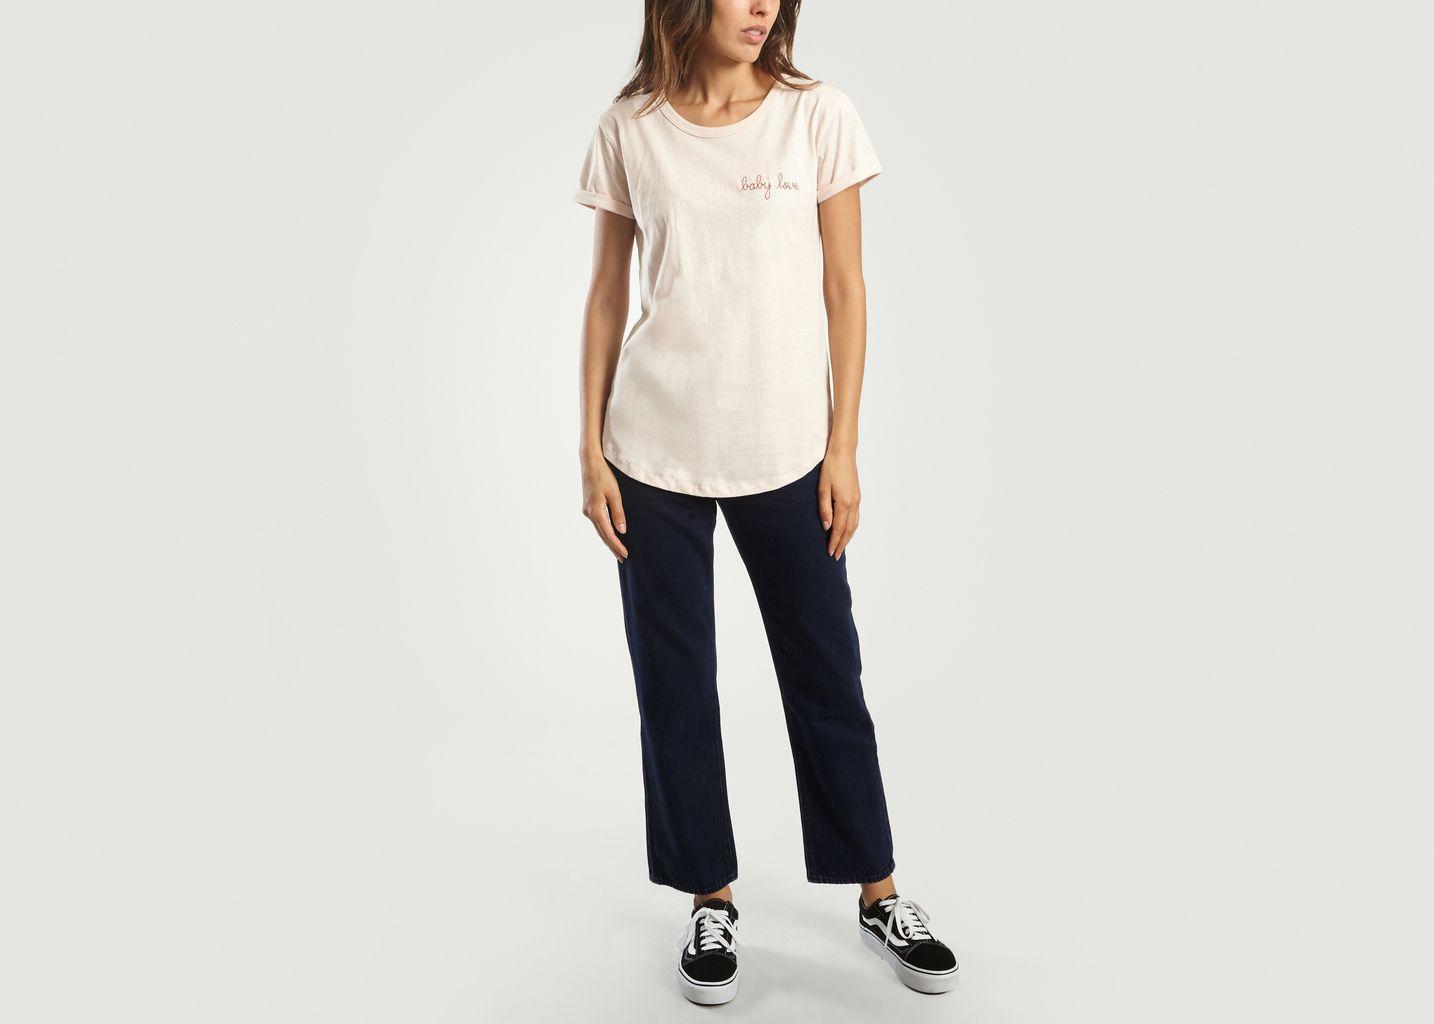 T-Shirt Baby Love - Maison Labiche